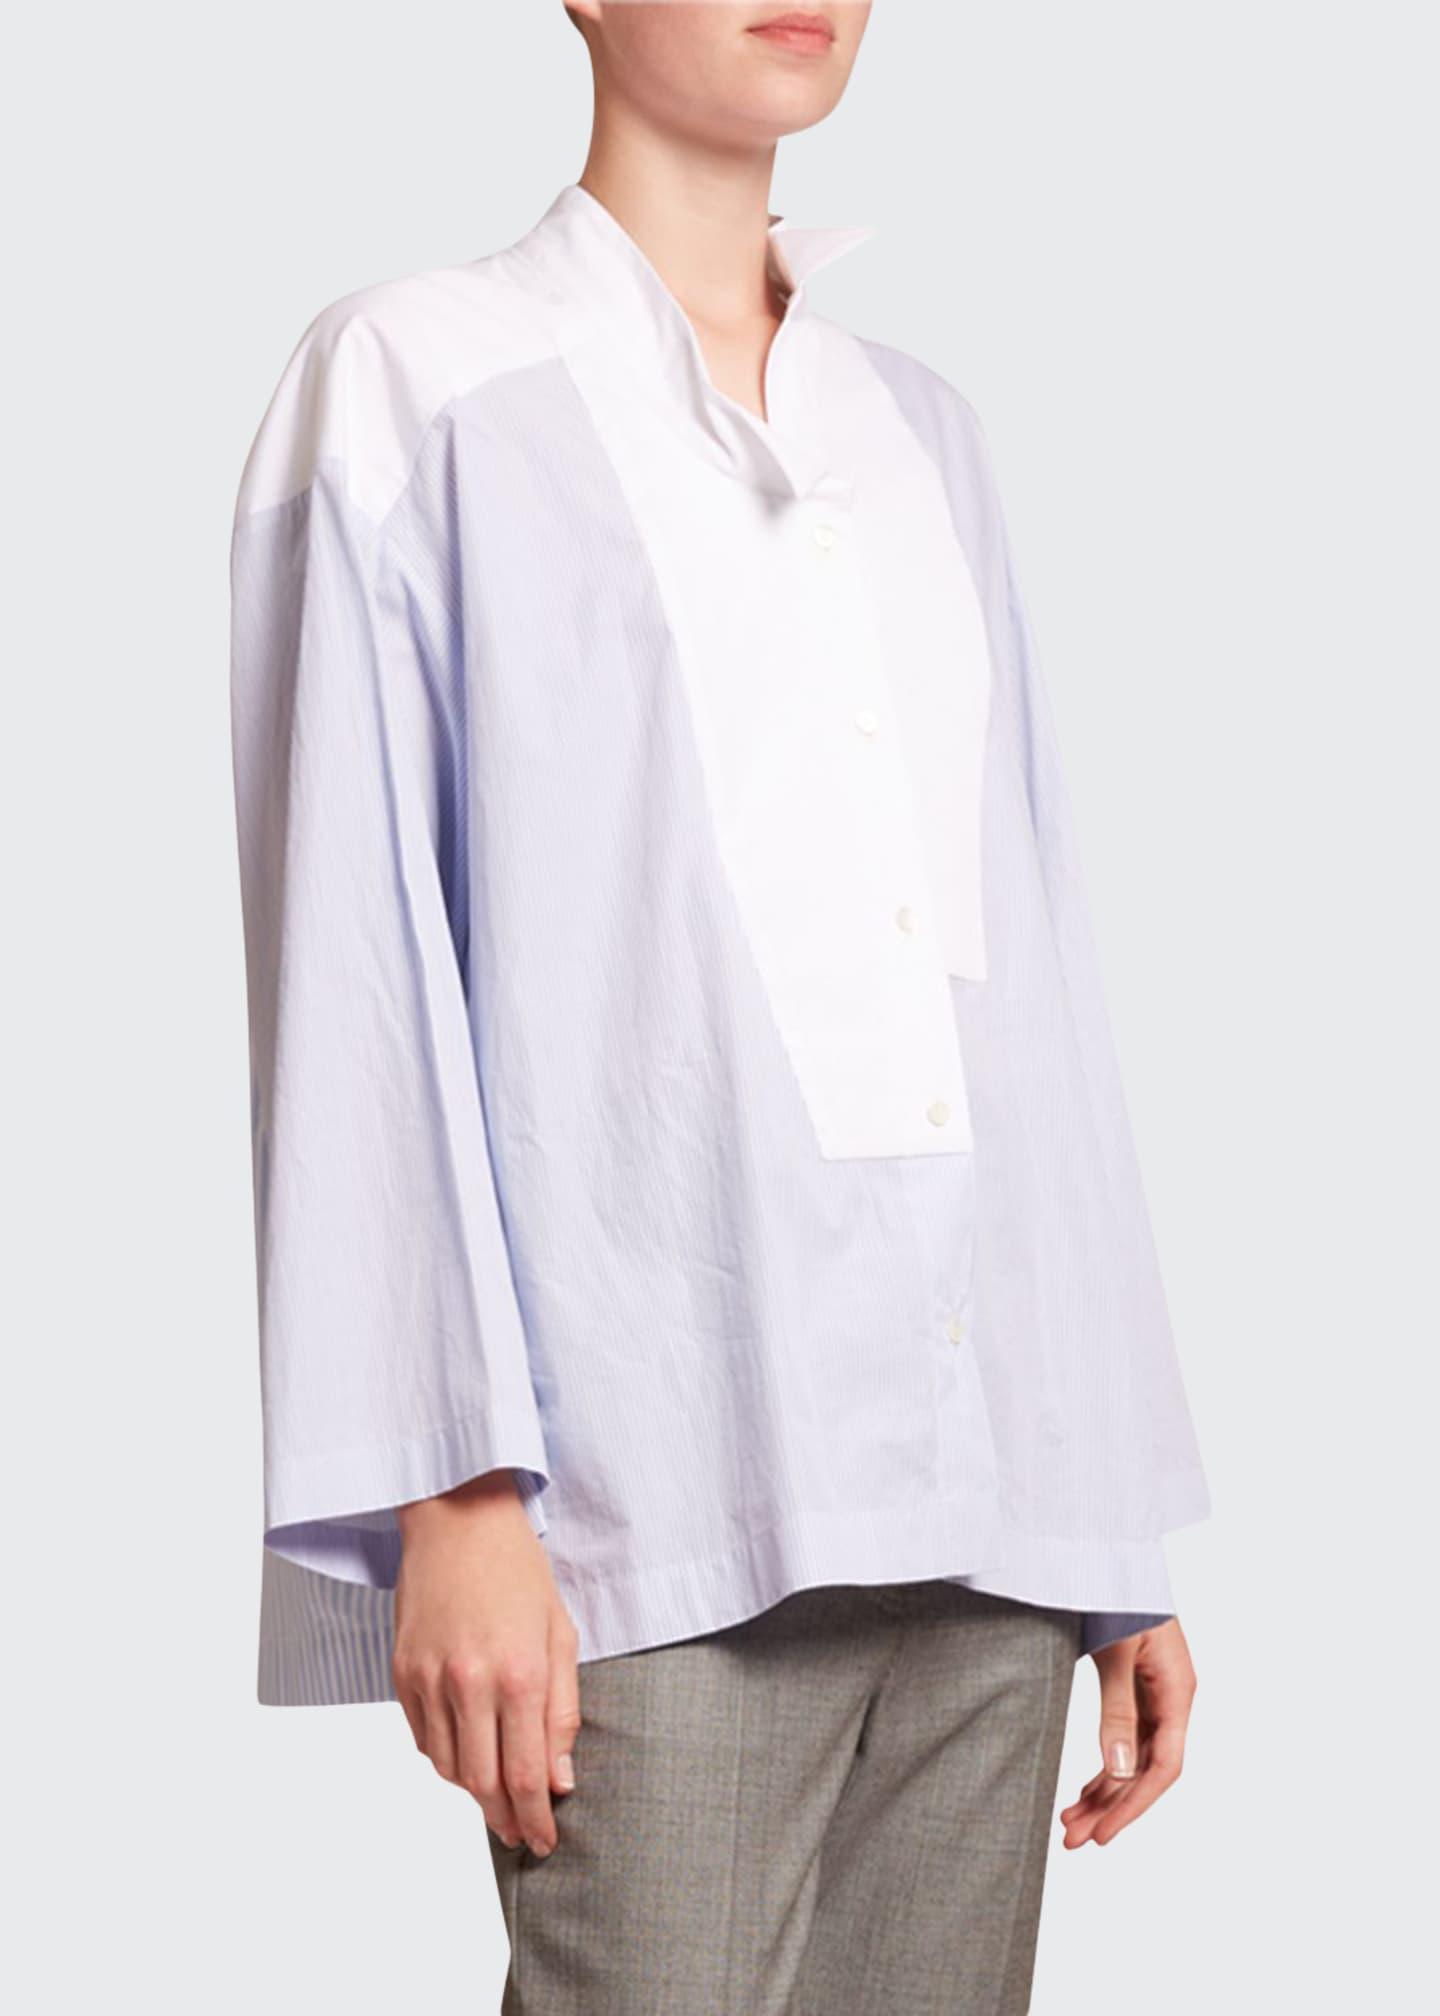 Loewe Striped Oversized Long-Sleeve Shirt